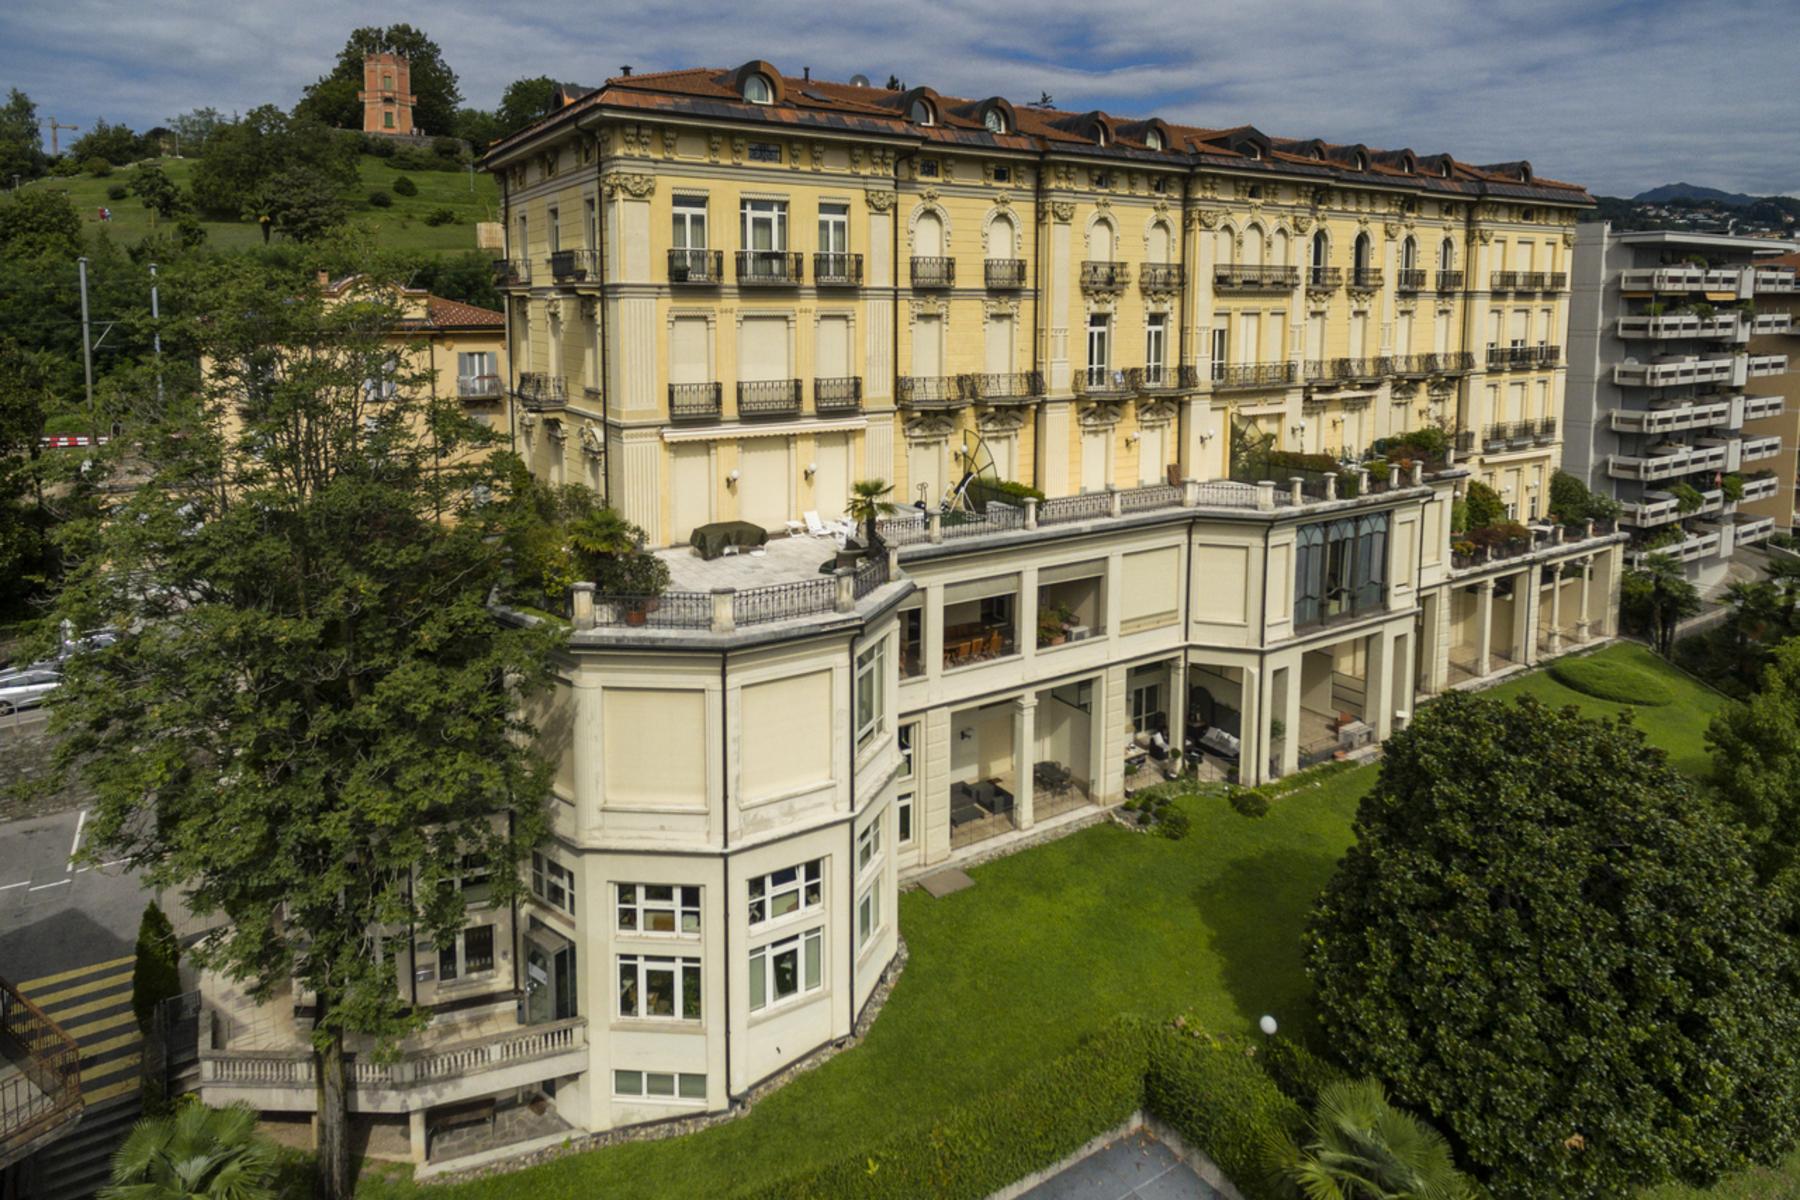 Duplex pour l à vendre à Prestigious duplex penthouse in a historic house Lugano, Lugano, Ticino, 6900 Suisse